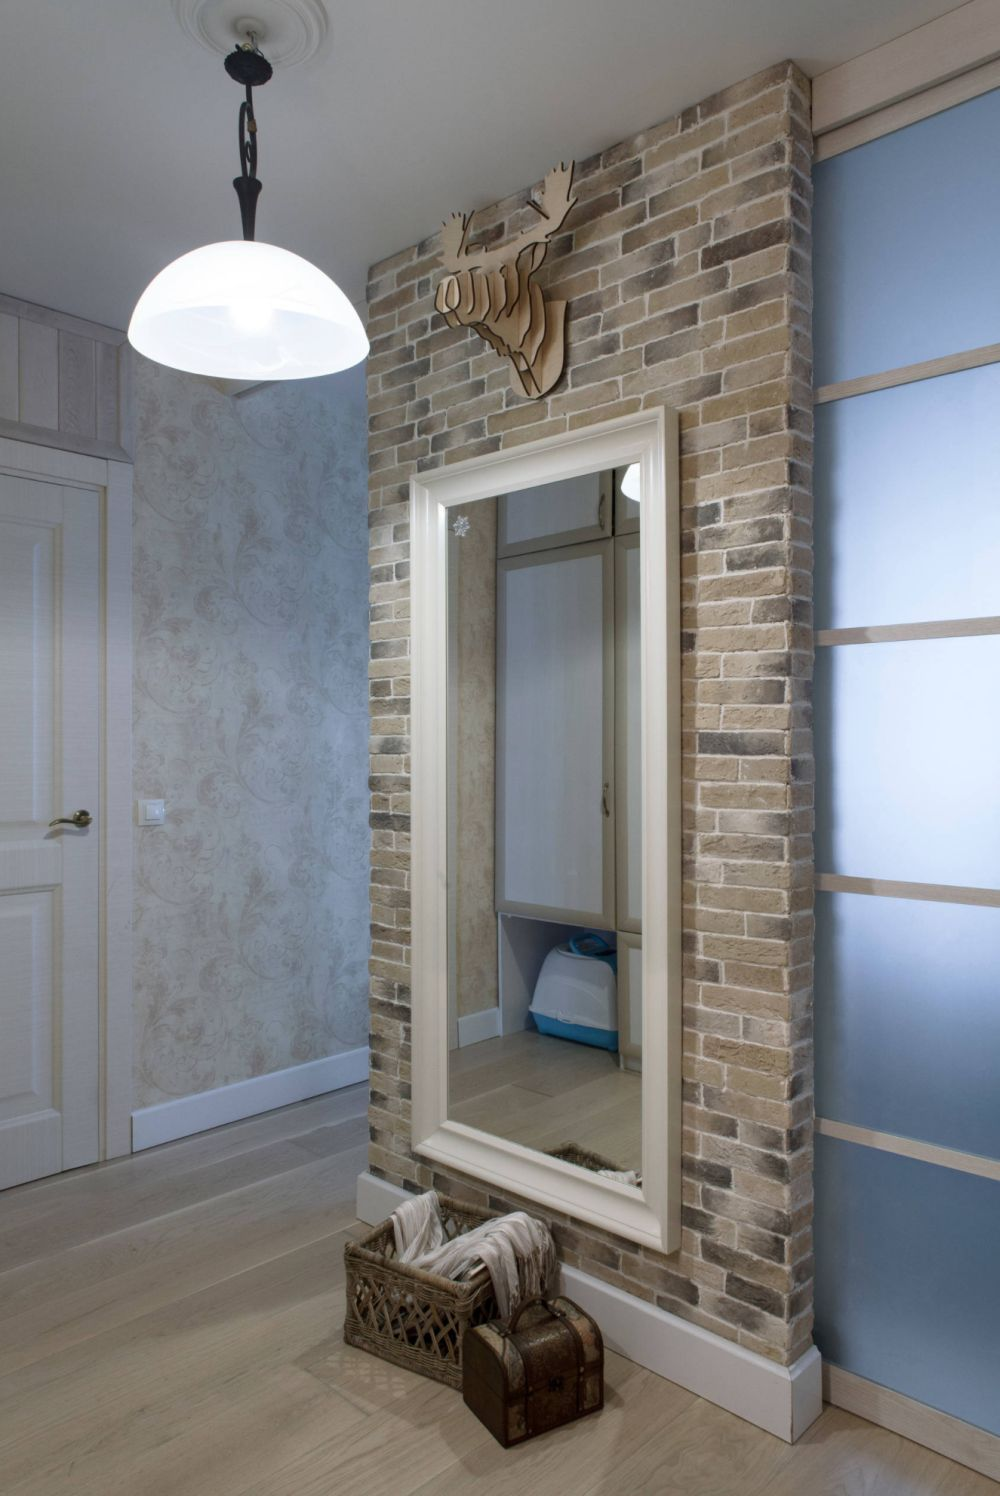 adelaparvu.com despre apartament 48 mp, stil provensal, Designer Svetlana Krasnova, Foto Natalia Kupriyanova (2)